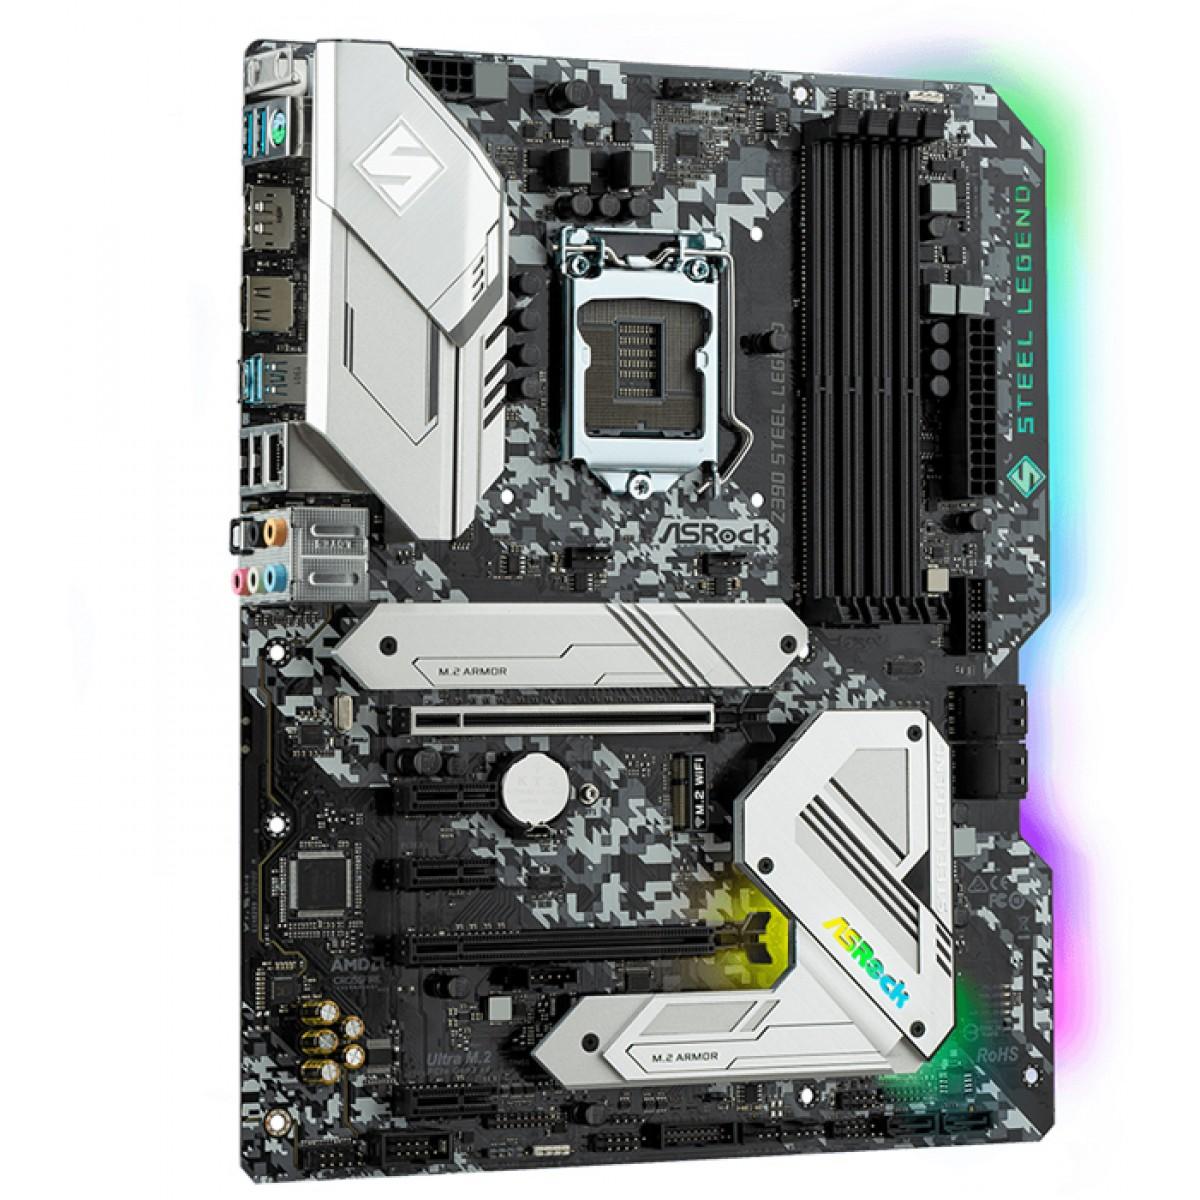 Placa Mãe Asrock Z390 Steel Legend, Chipset Z390, Intel LGA 1151, ATX, DDR4, 90-MXBAL0-A0UAYZ